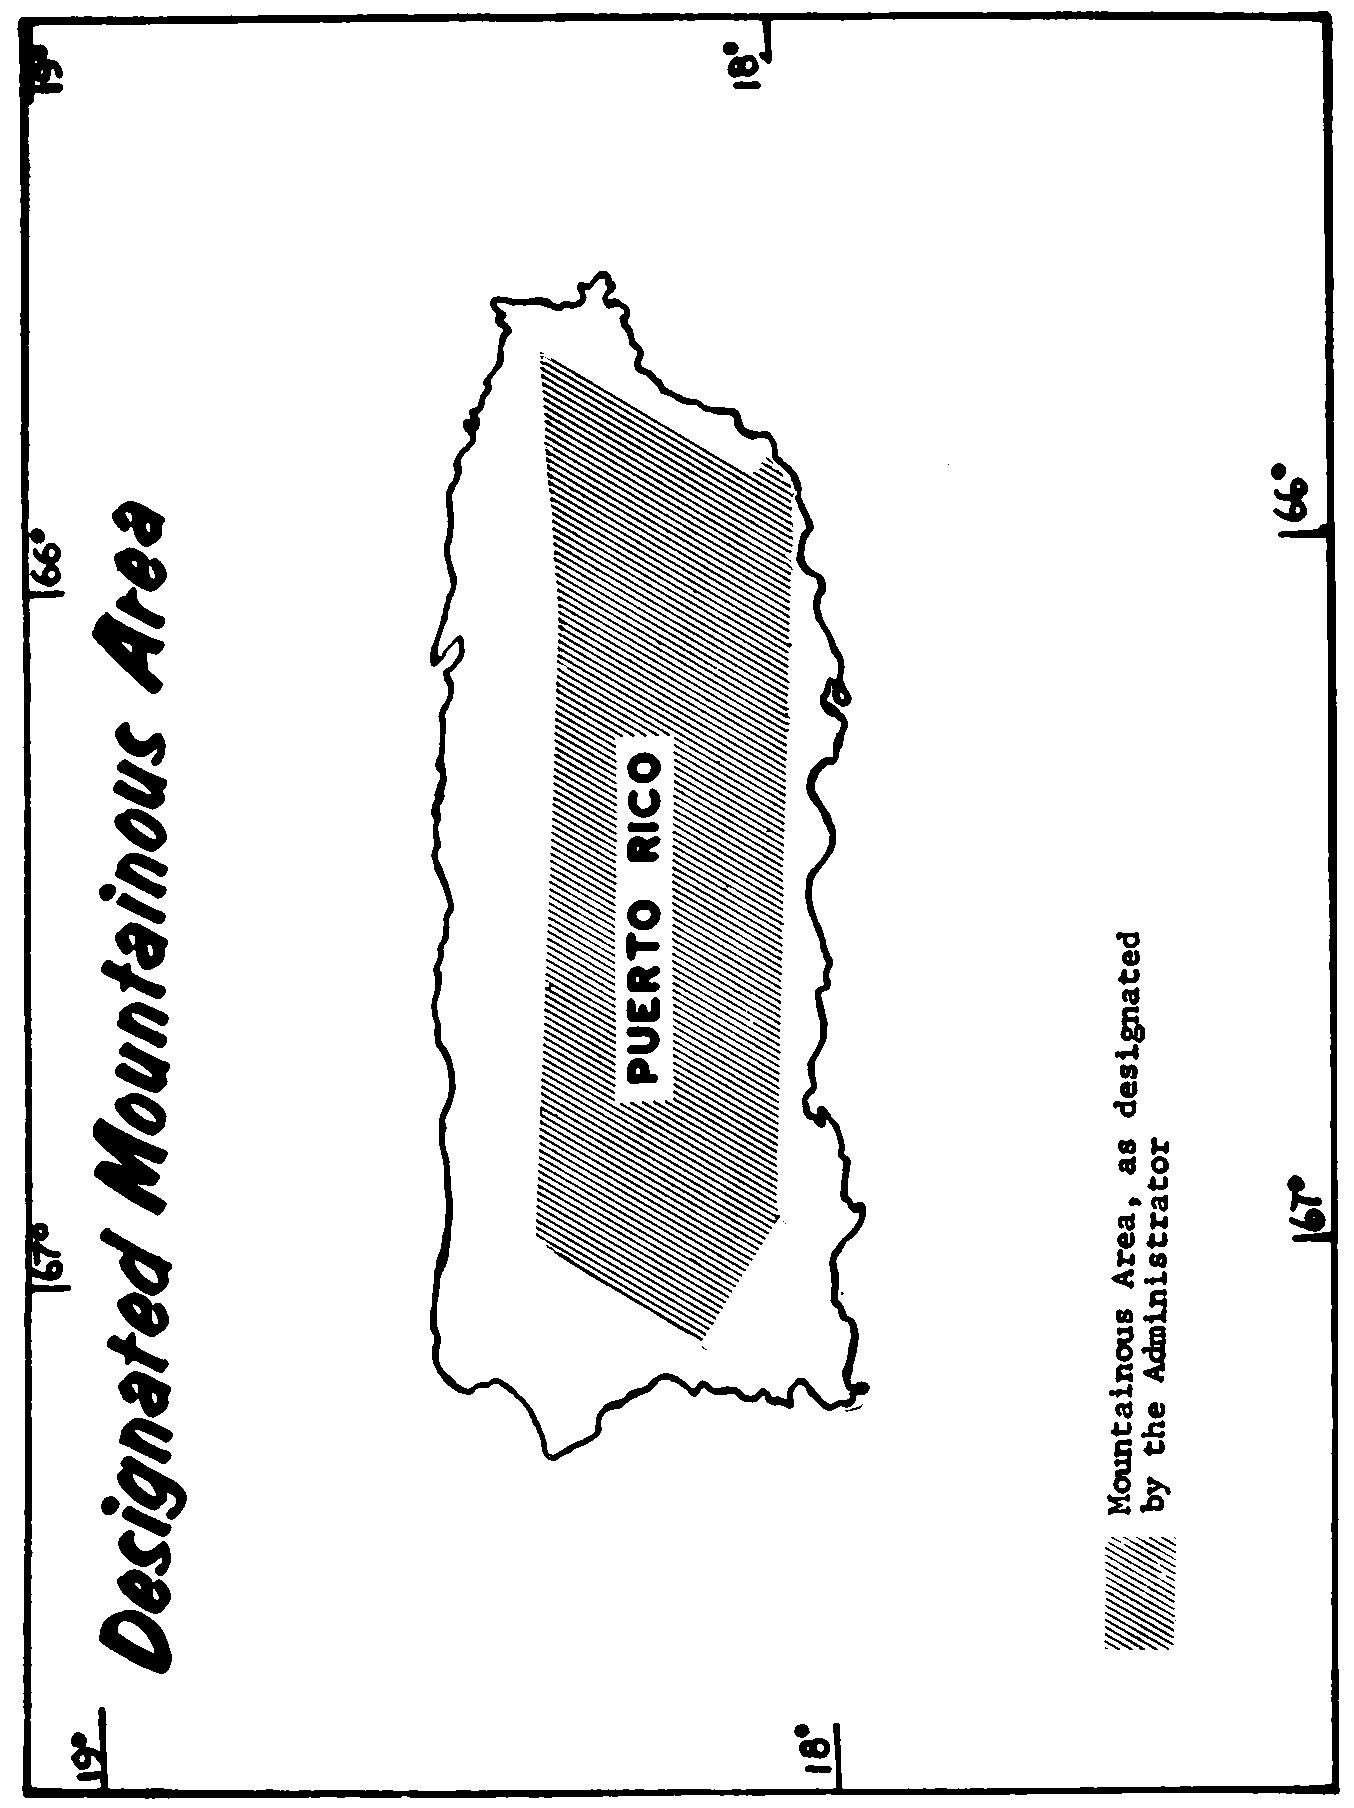 Graphic of Beginning at latitude 18°22′ N., longitude 66°58′ W., thence to latitude 18°19′ N., longitude 66°06′ W.; thence to latitude 18°20′ N., longitude 65°50′ W.; thence to latitude 18°20′ N., longitude 65°42′ W.; thence to latitude 18°03′ N., longitude 65°52′ W.; thence to latitude 18°02′ N., longitude 65°51′ W.; thence to latitude 17°59′ N., longitude 65°55′ W.; thence to latitude 18°05′ N., longitude 66°57′ W.; thence to latitude 18°11′ N., longitude 67°07′ W.; thence to latitude 18°22′ N., longitude 66°58′ W.; the point of beginning.